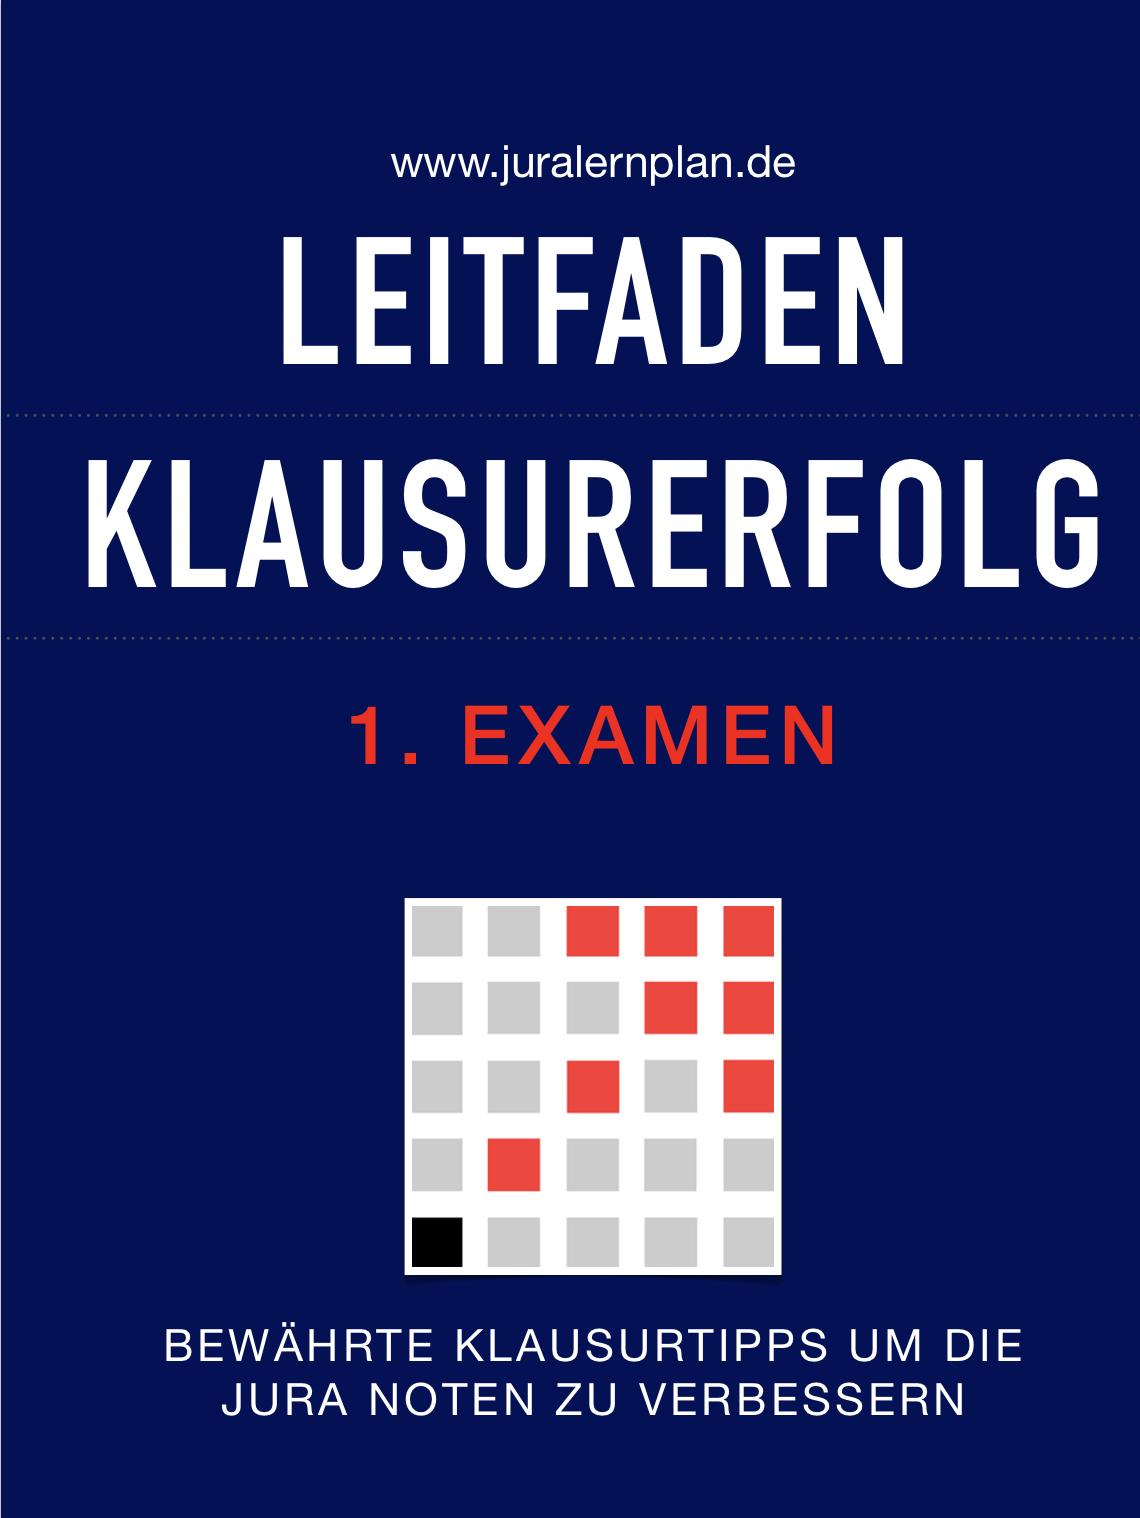 Leitfaden Klausurerfolg 1. Examen - JURALERNPLAN Jura Lernplan Studium Examen